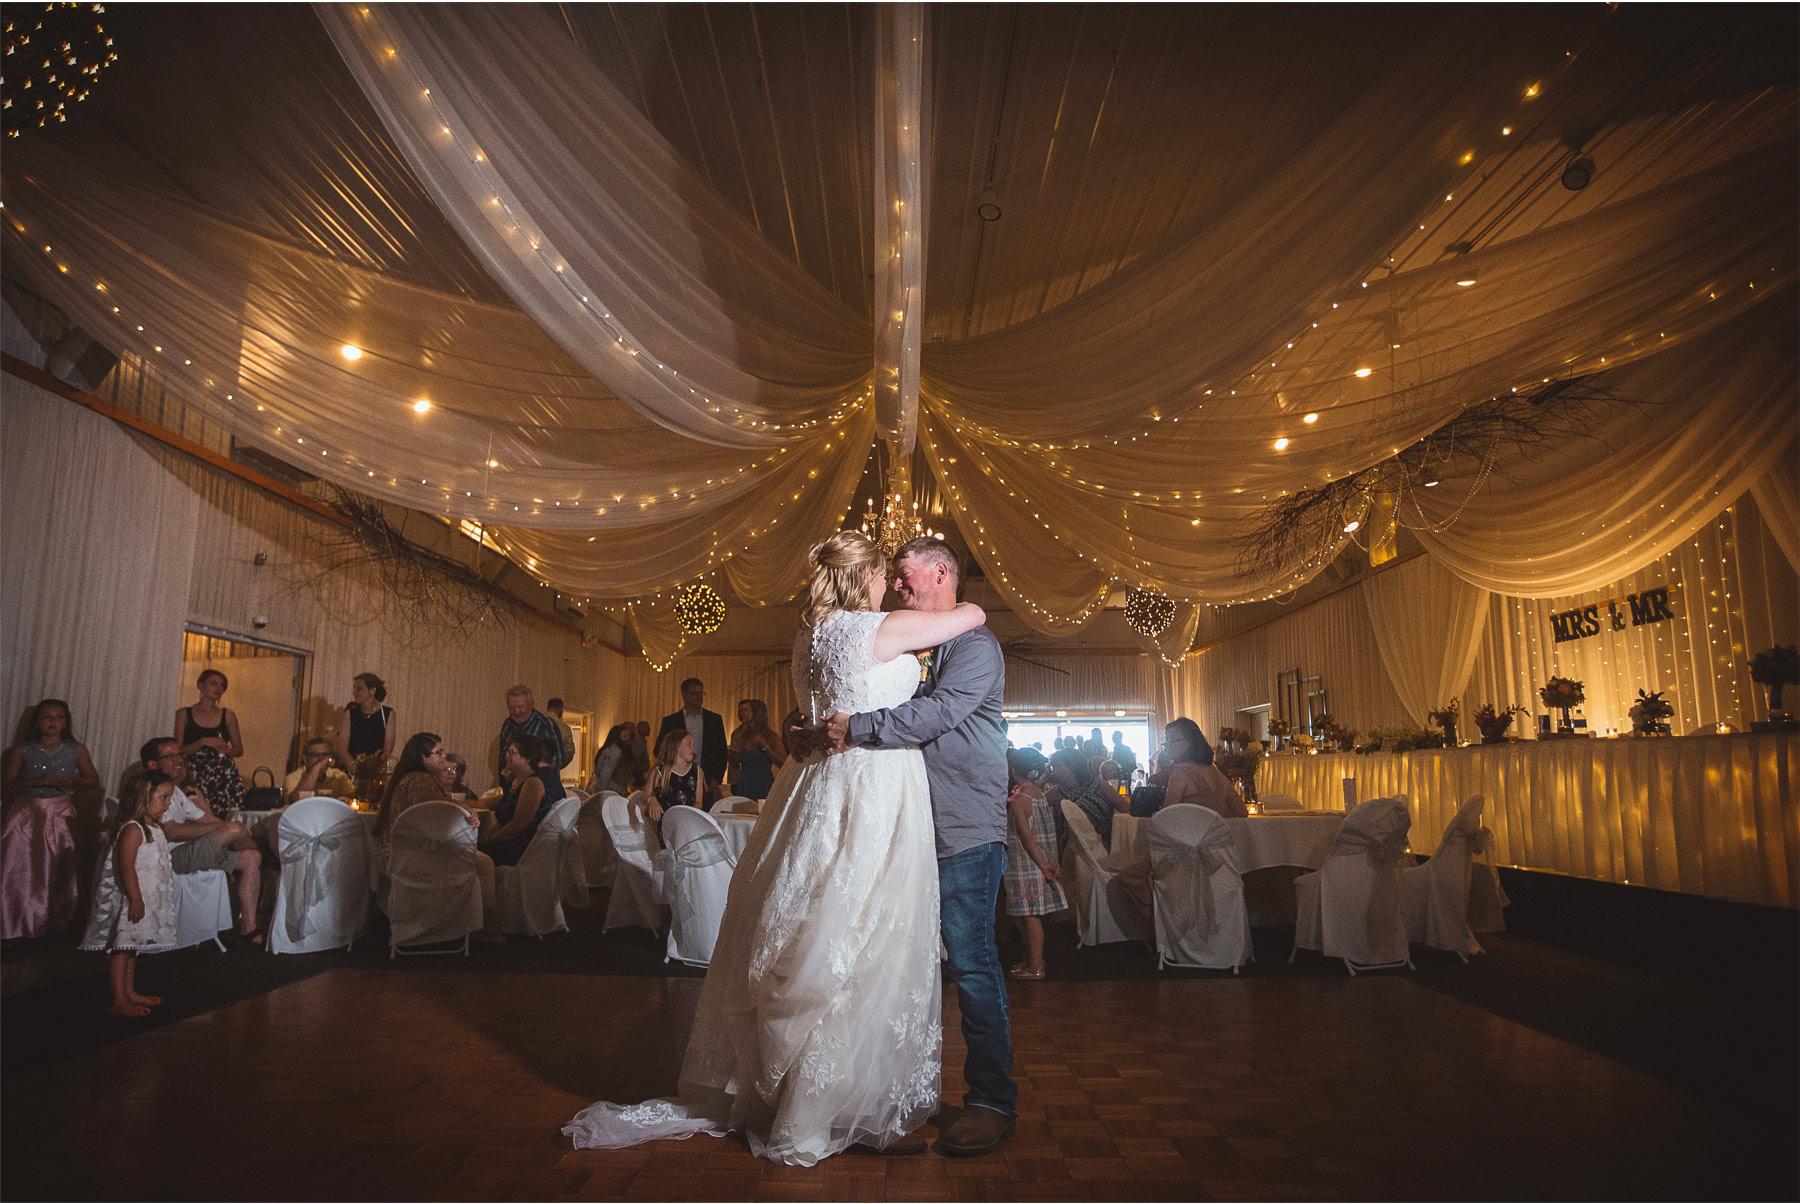 12-Vick-Photography-Wedding-Brainerd-Minnesota-Pine-Peaks-Lodge-Cabin-Rustic-Reception-Dance-Kristi-and-Noel.jpg